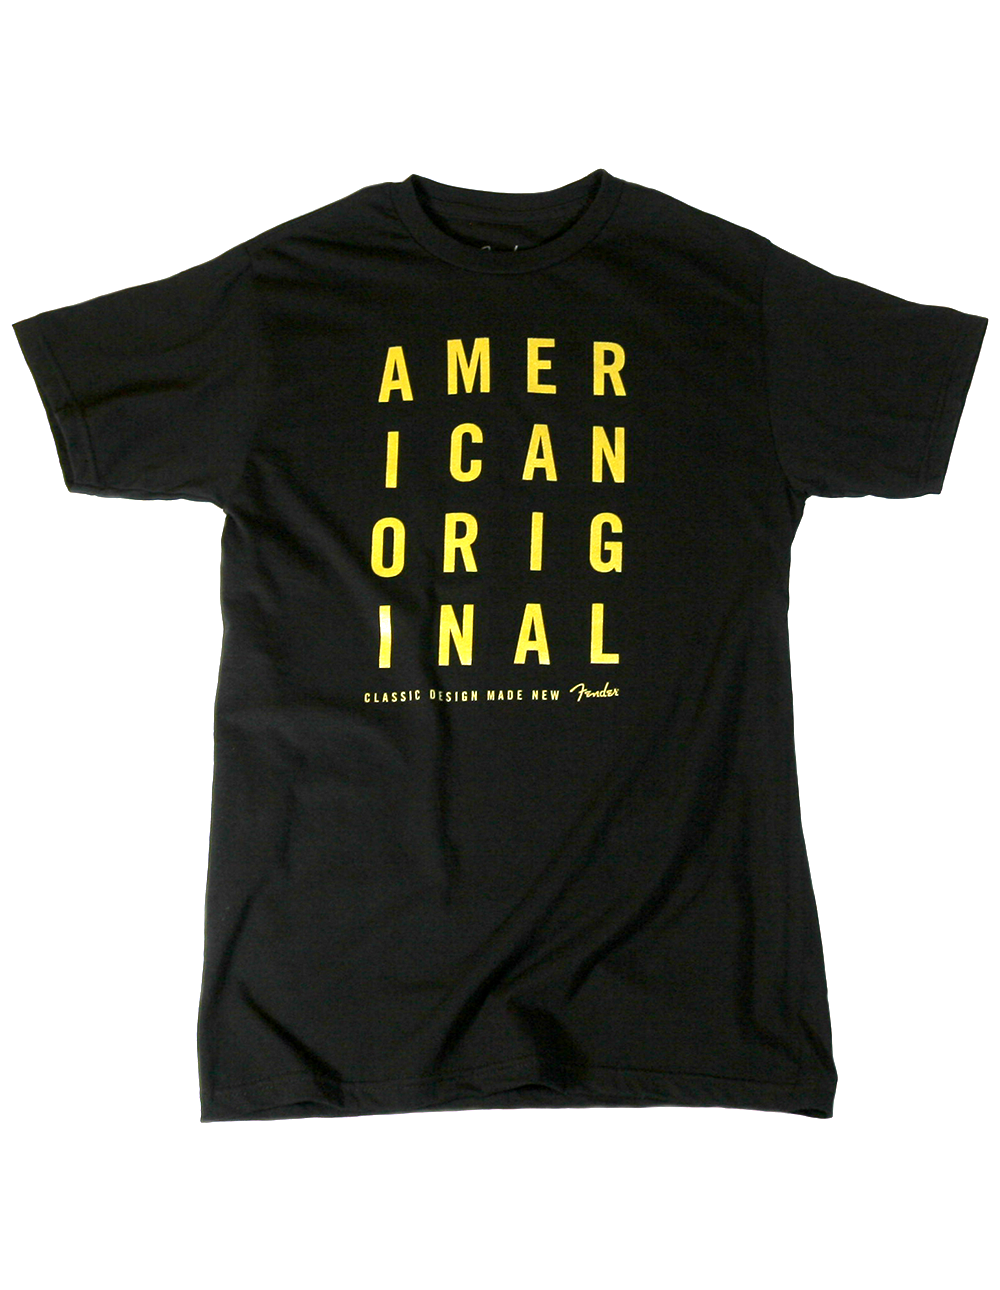 Art and Ink Fender American Original black t-shirt